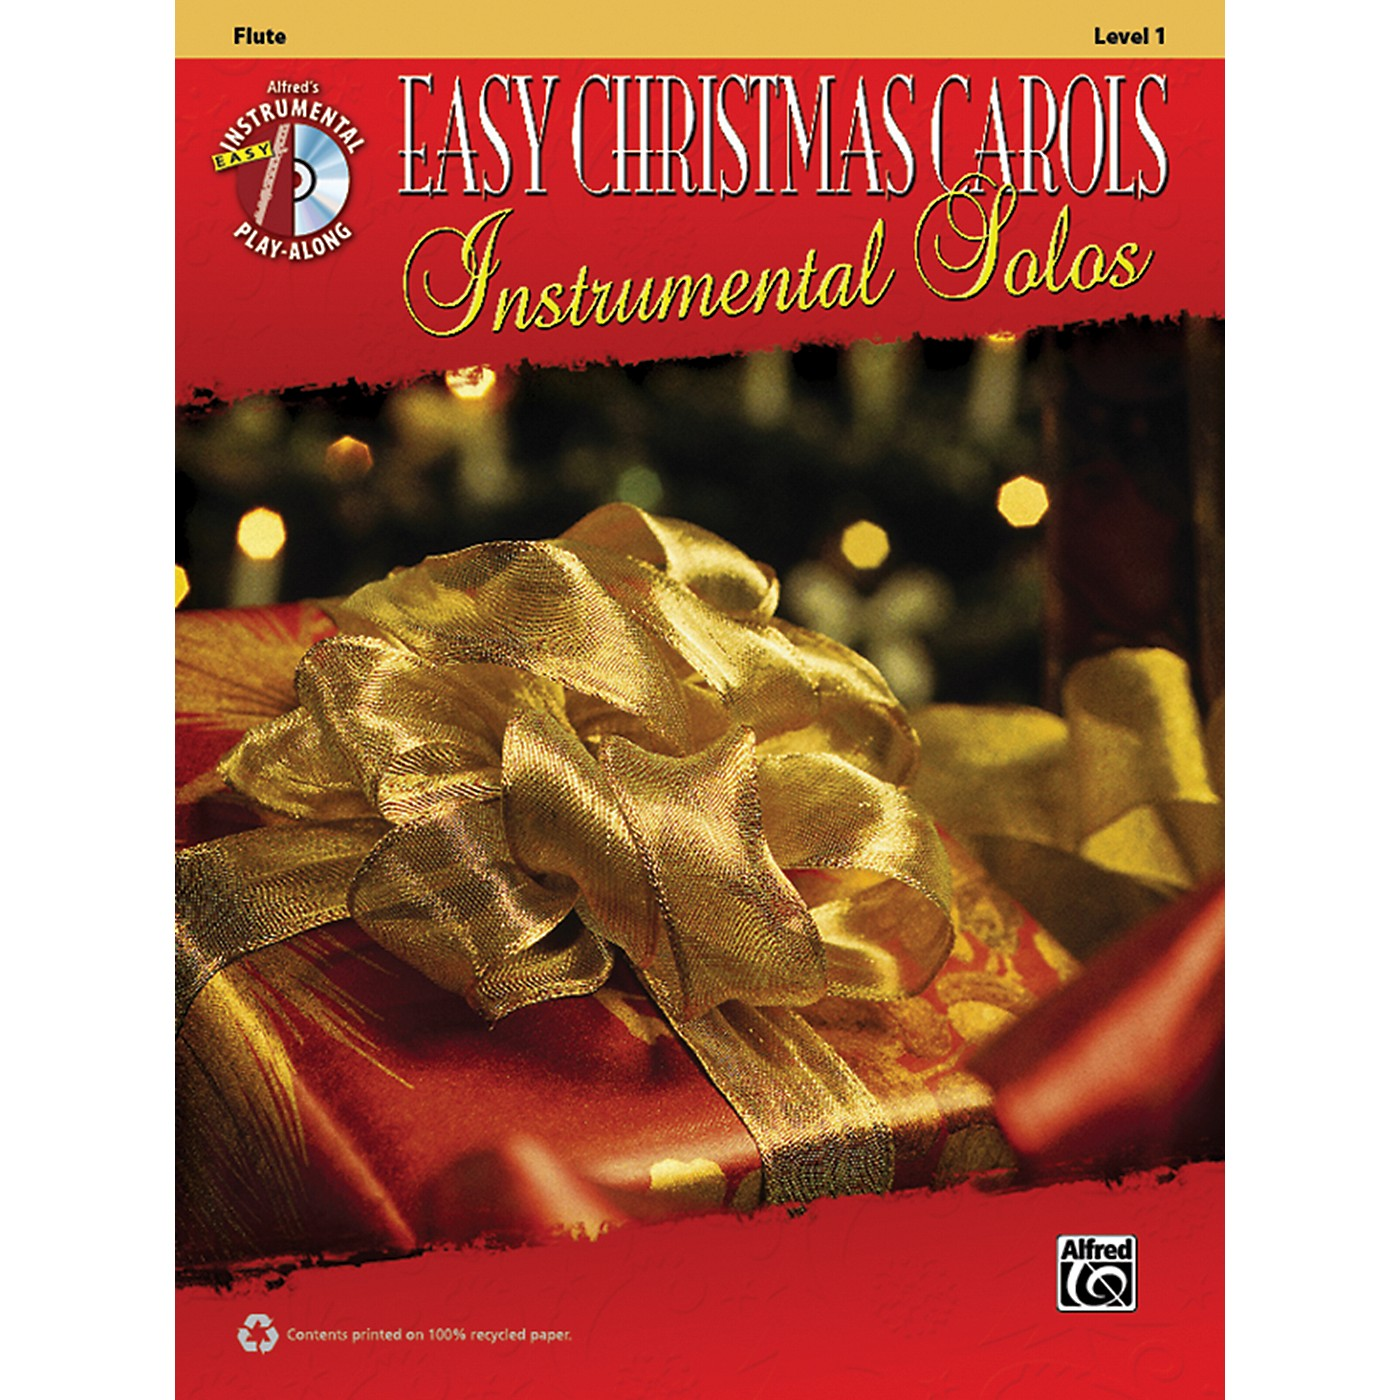 Alfred Easy Christmas Carols Instrumental Solos Flute Book & CD thumbnail